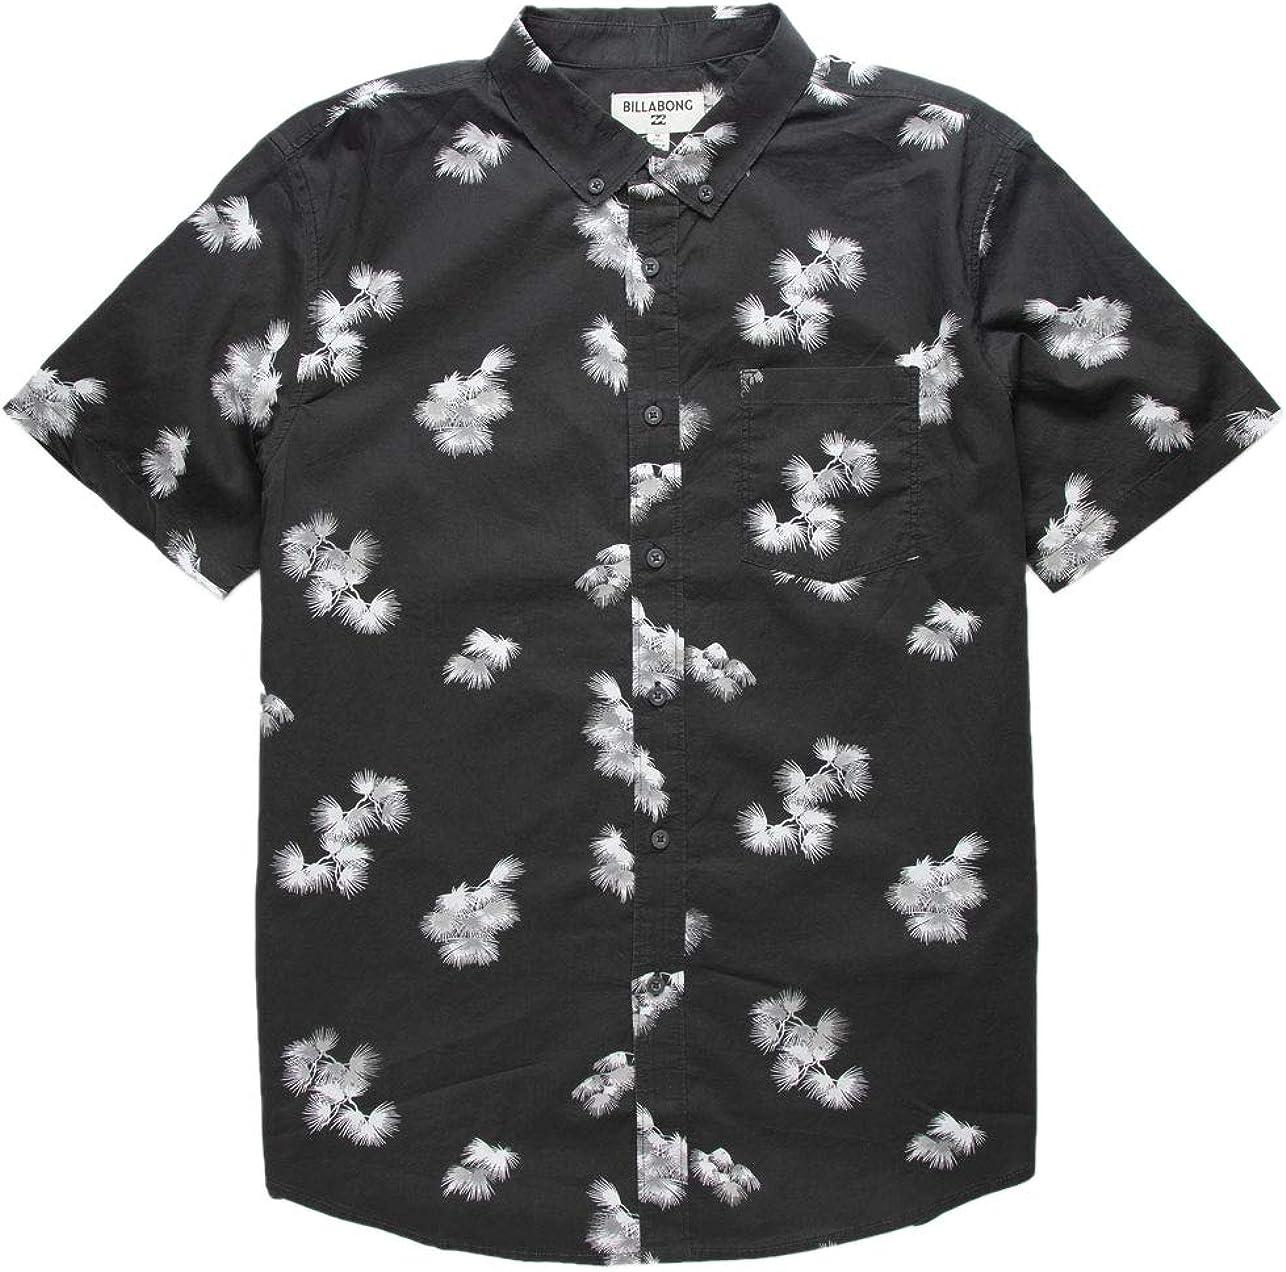 Billabong Large discharge sale Men's Sundays Mini Popularity Woven Shirt Short Sleeve